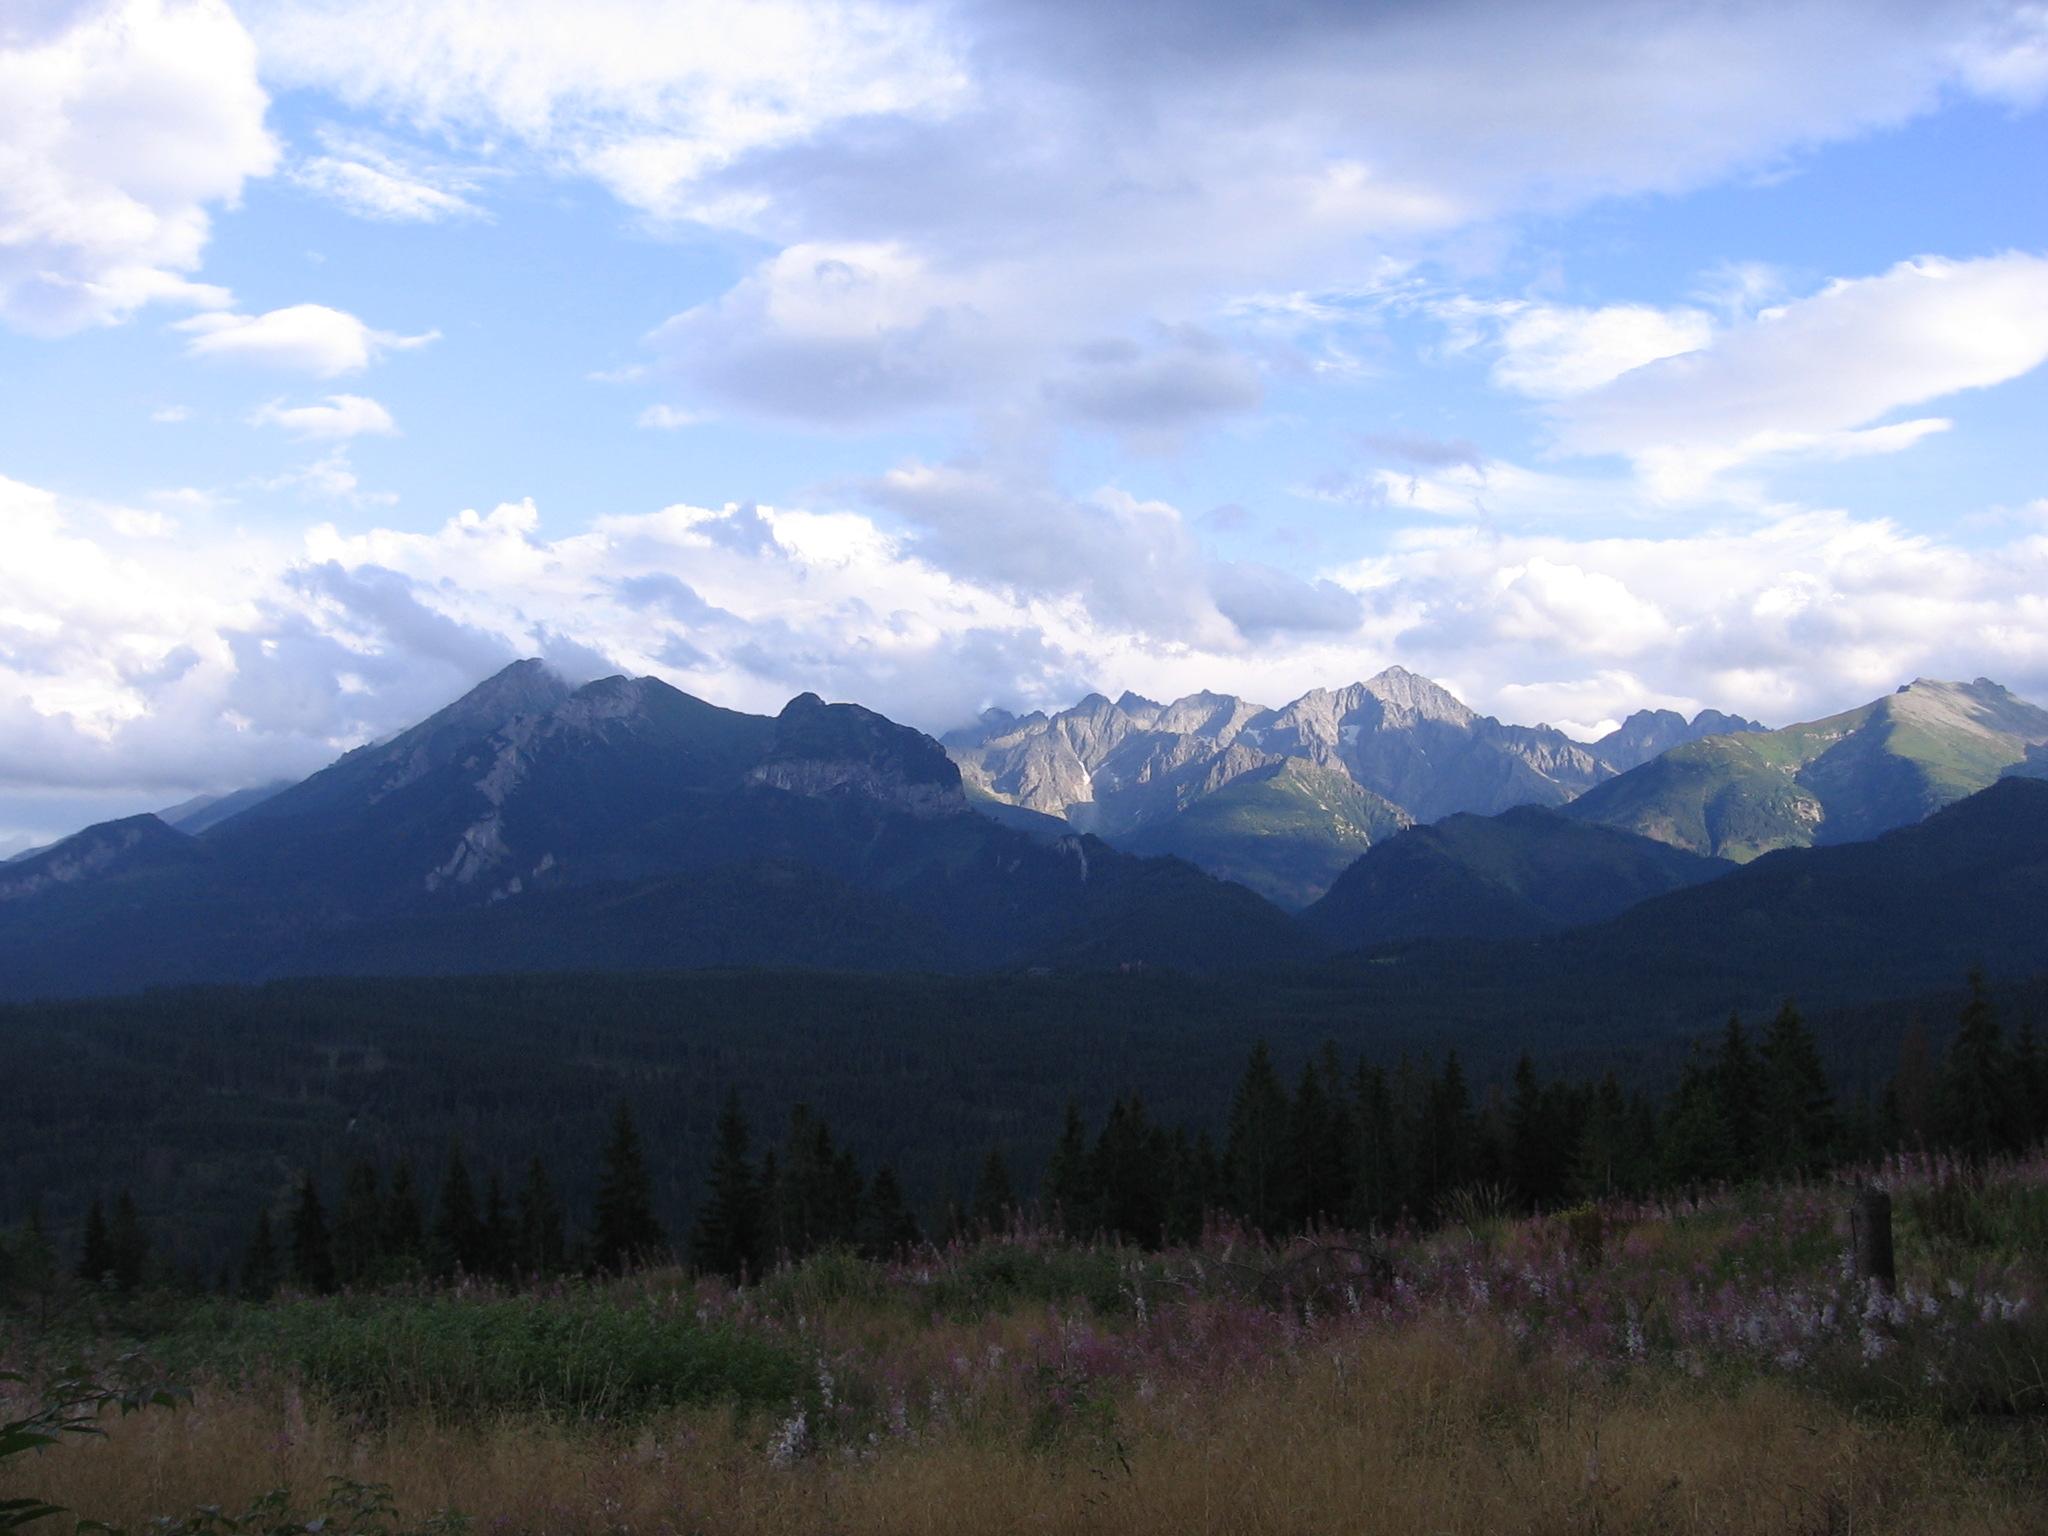 Tatra_mountains_view_from_glodowka.JPG